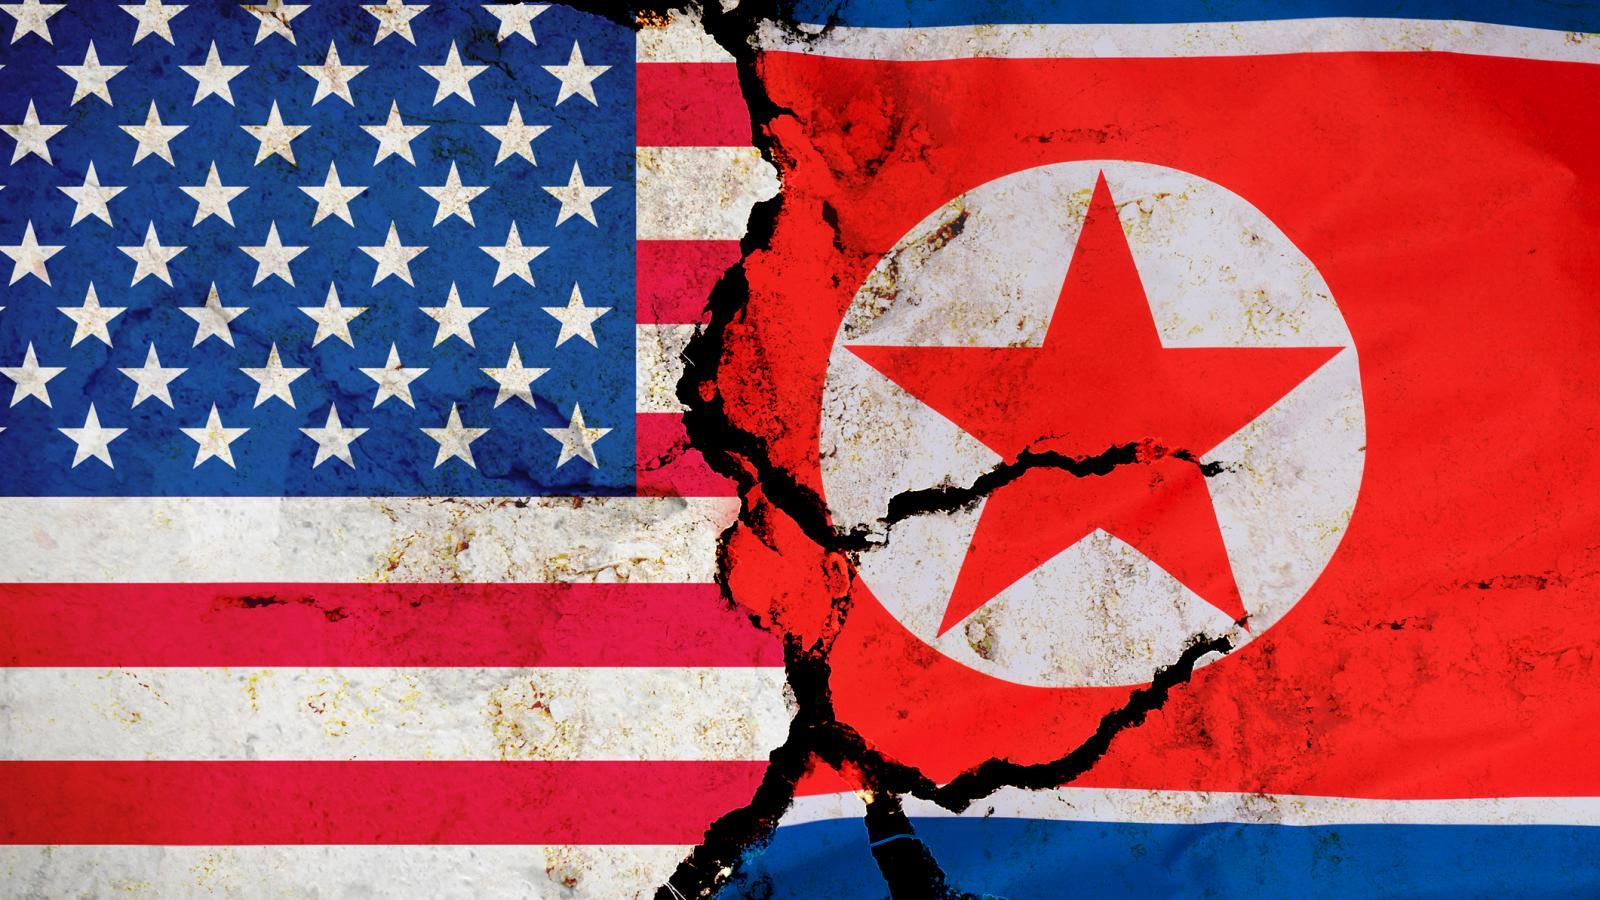 North Korea Issues Warnings to U.S and South Korea